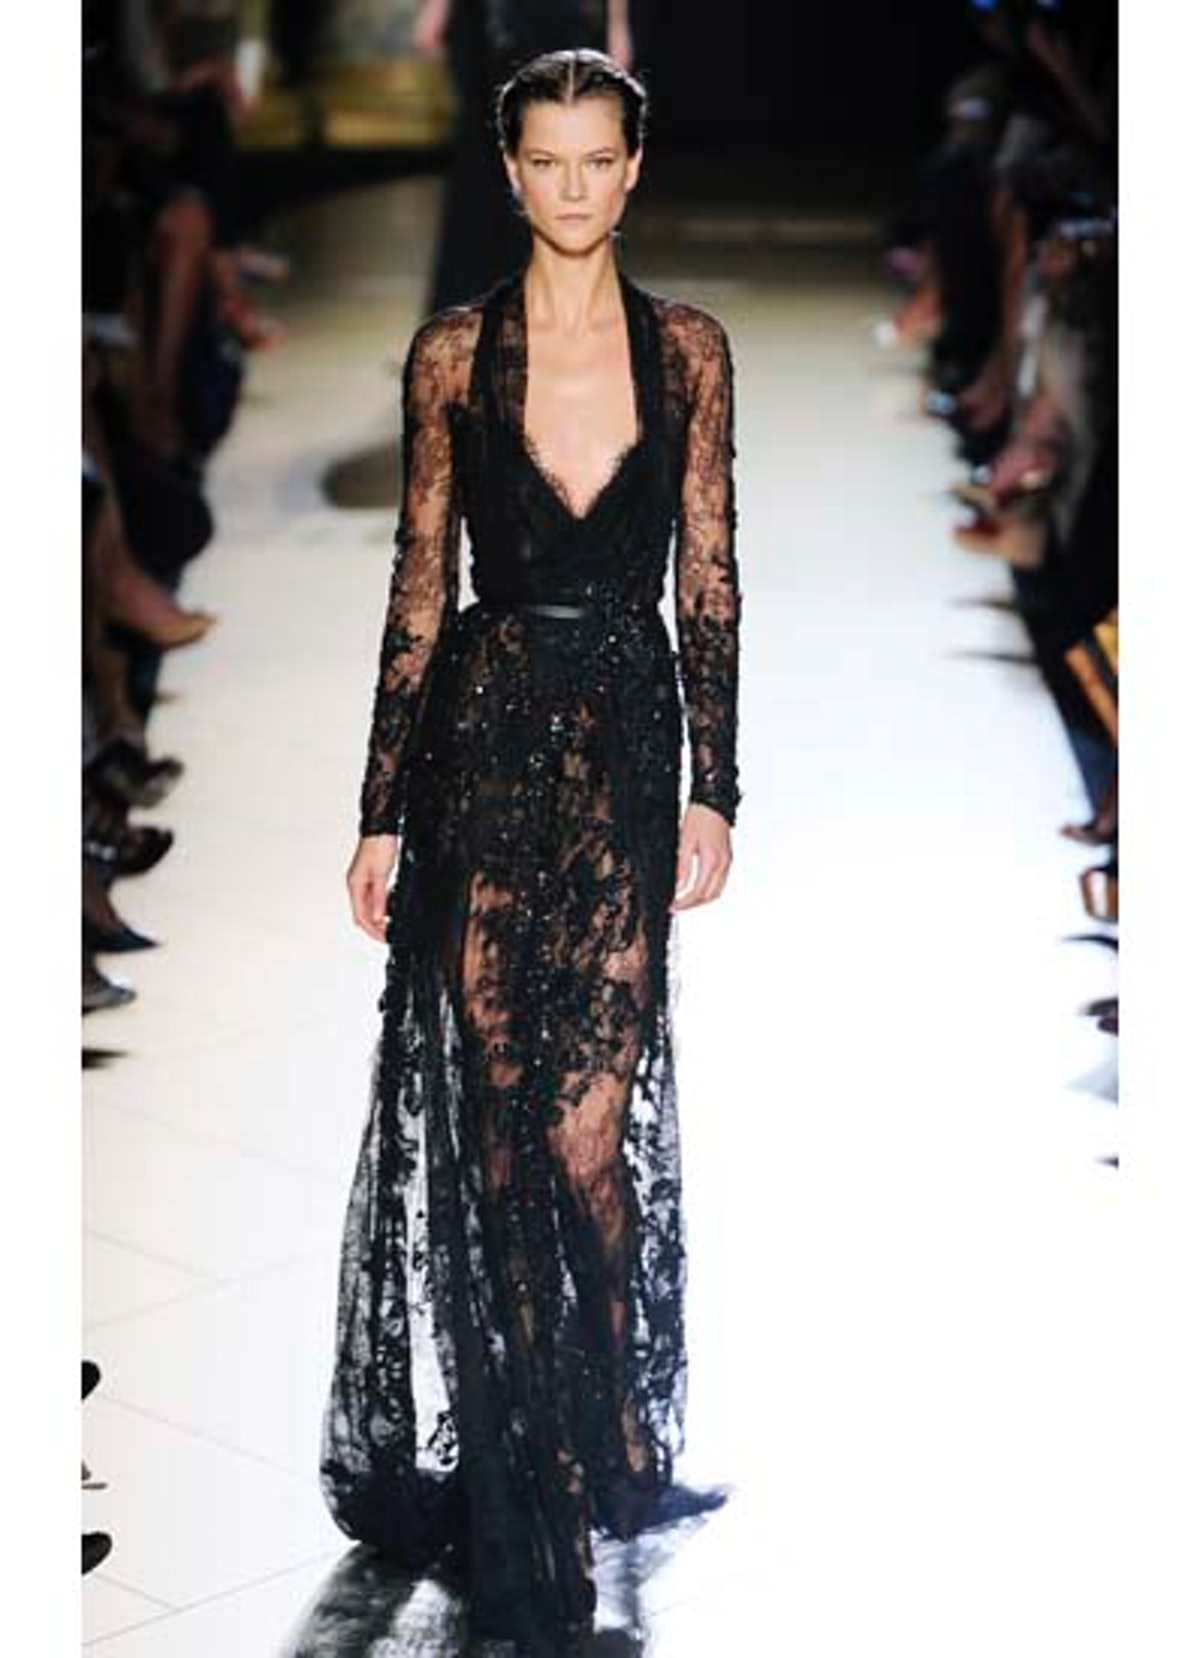 fass-elie-saab-couture-2012-runway-03-v.jpg